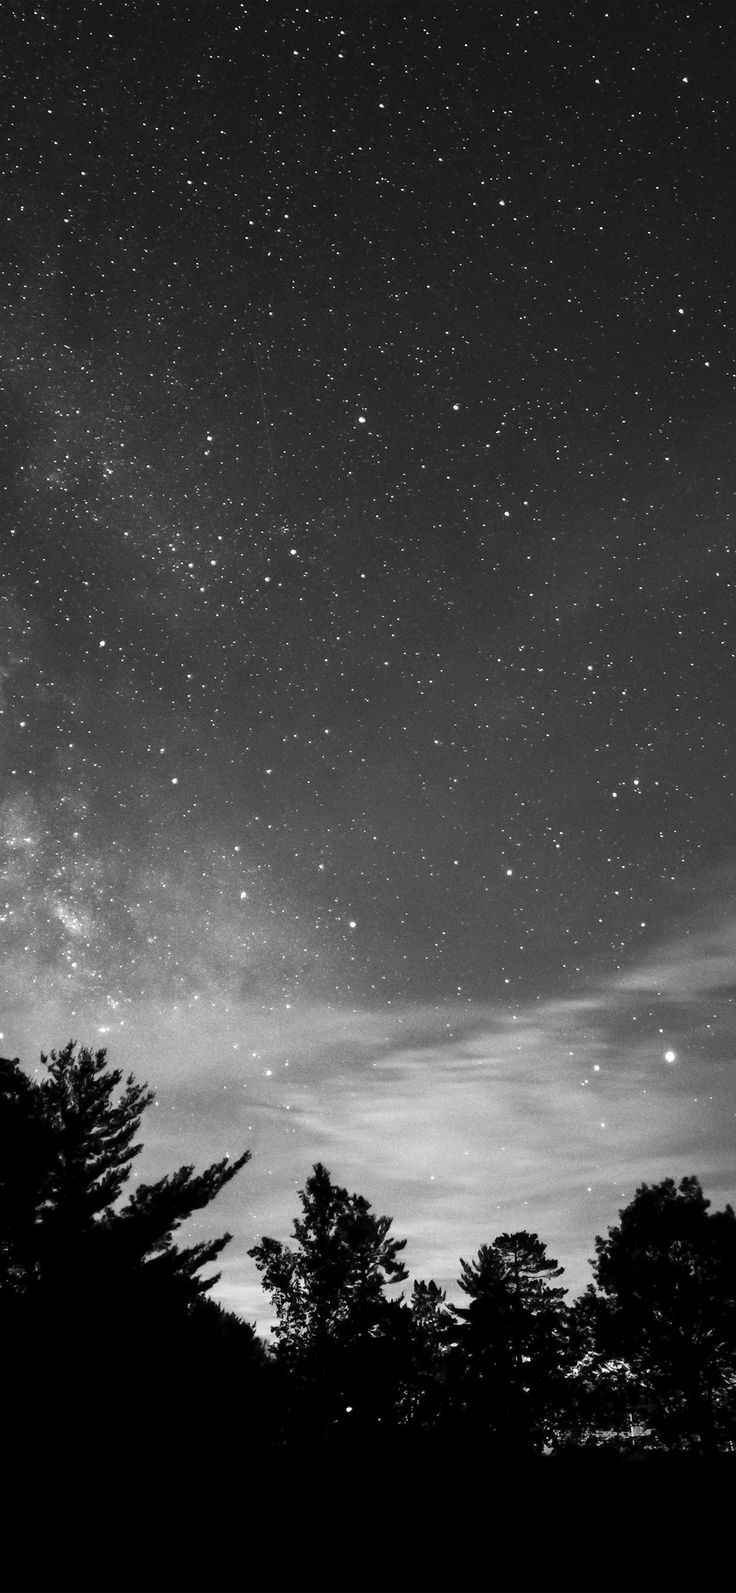 Iphone X Wallpaper Mv72 Sky Night Star Dark Mountain Cloud Shadow